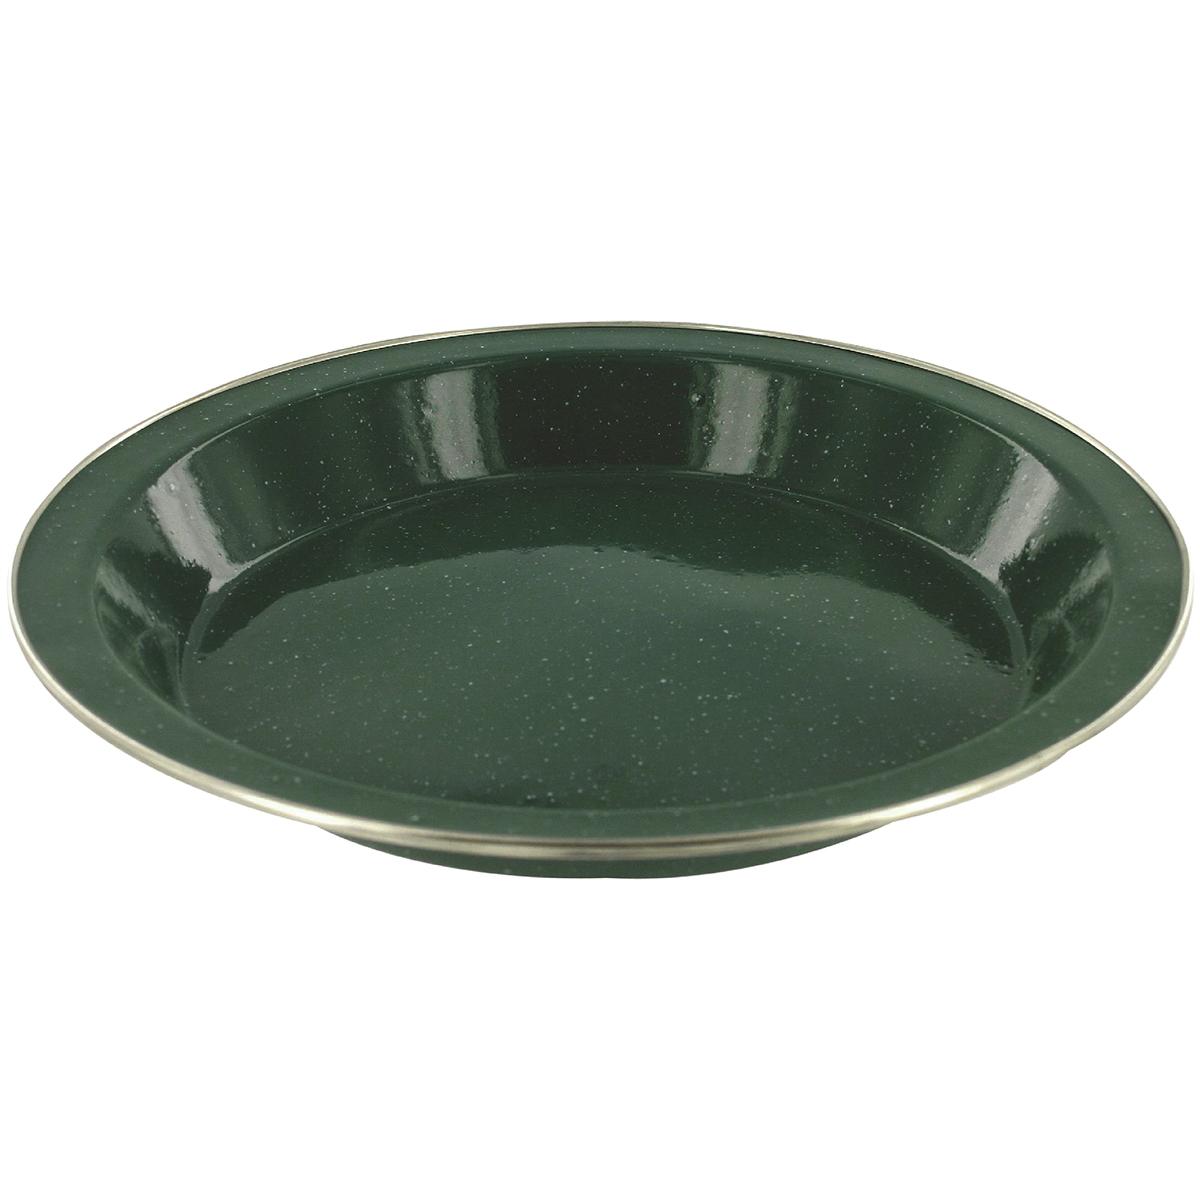 Campingkeuken Deluxe : Enamel Metal Dinner Plates